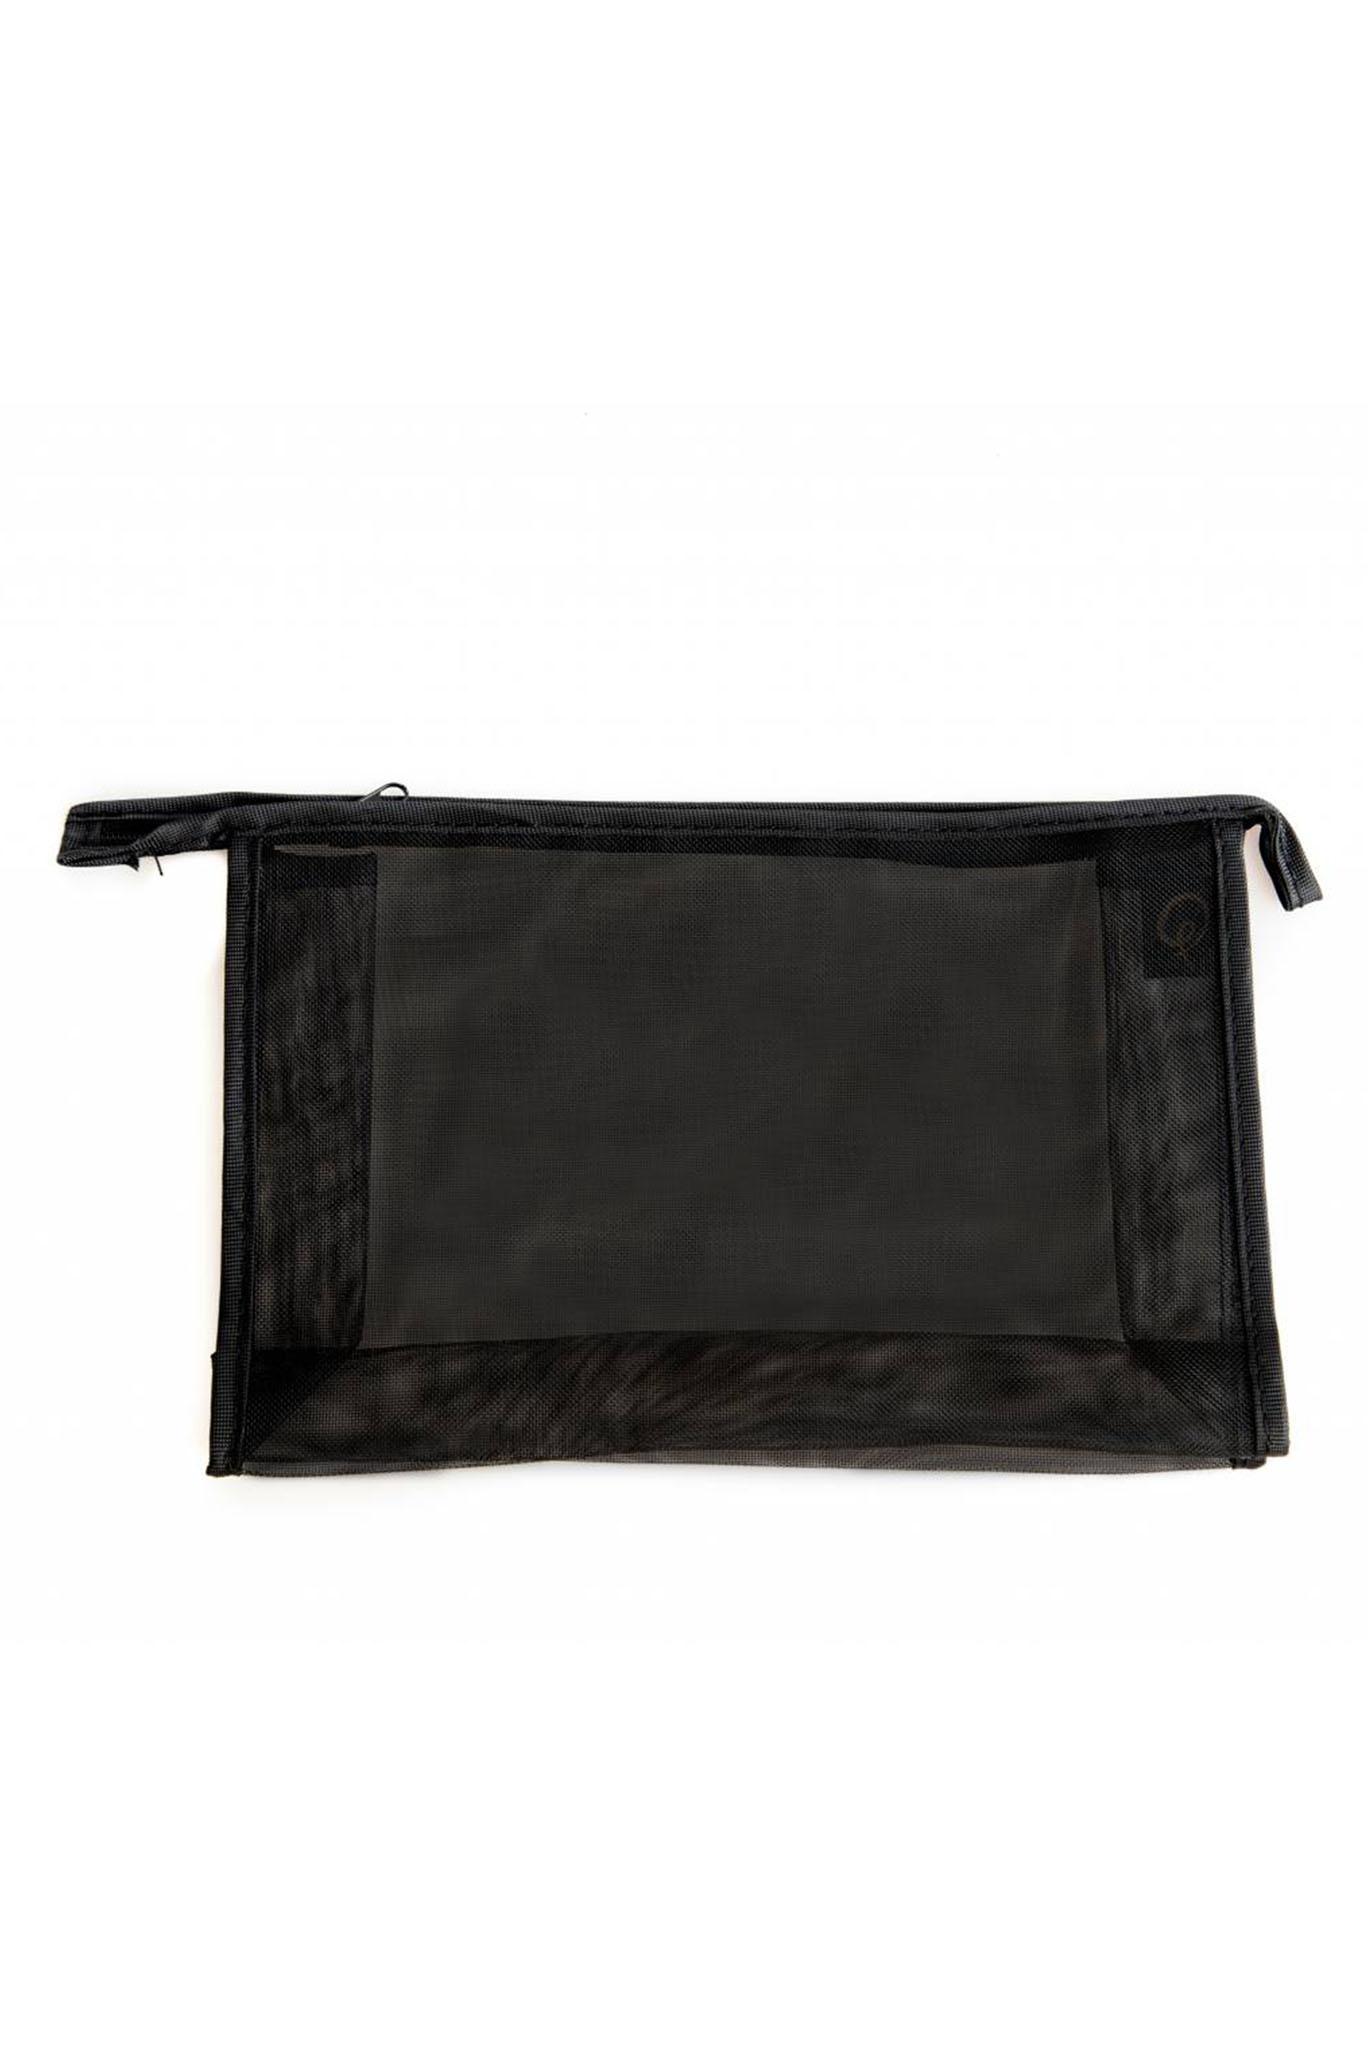 Pillows Toiletry bag